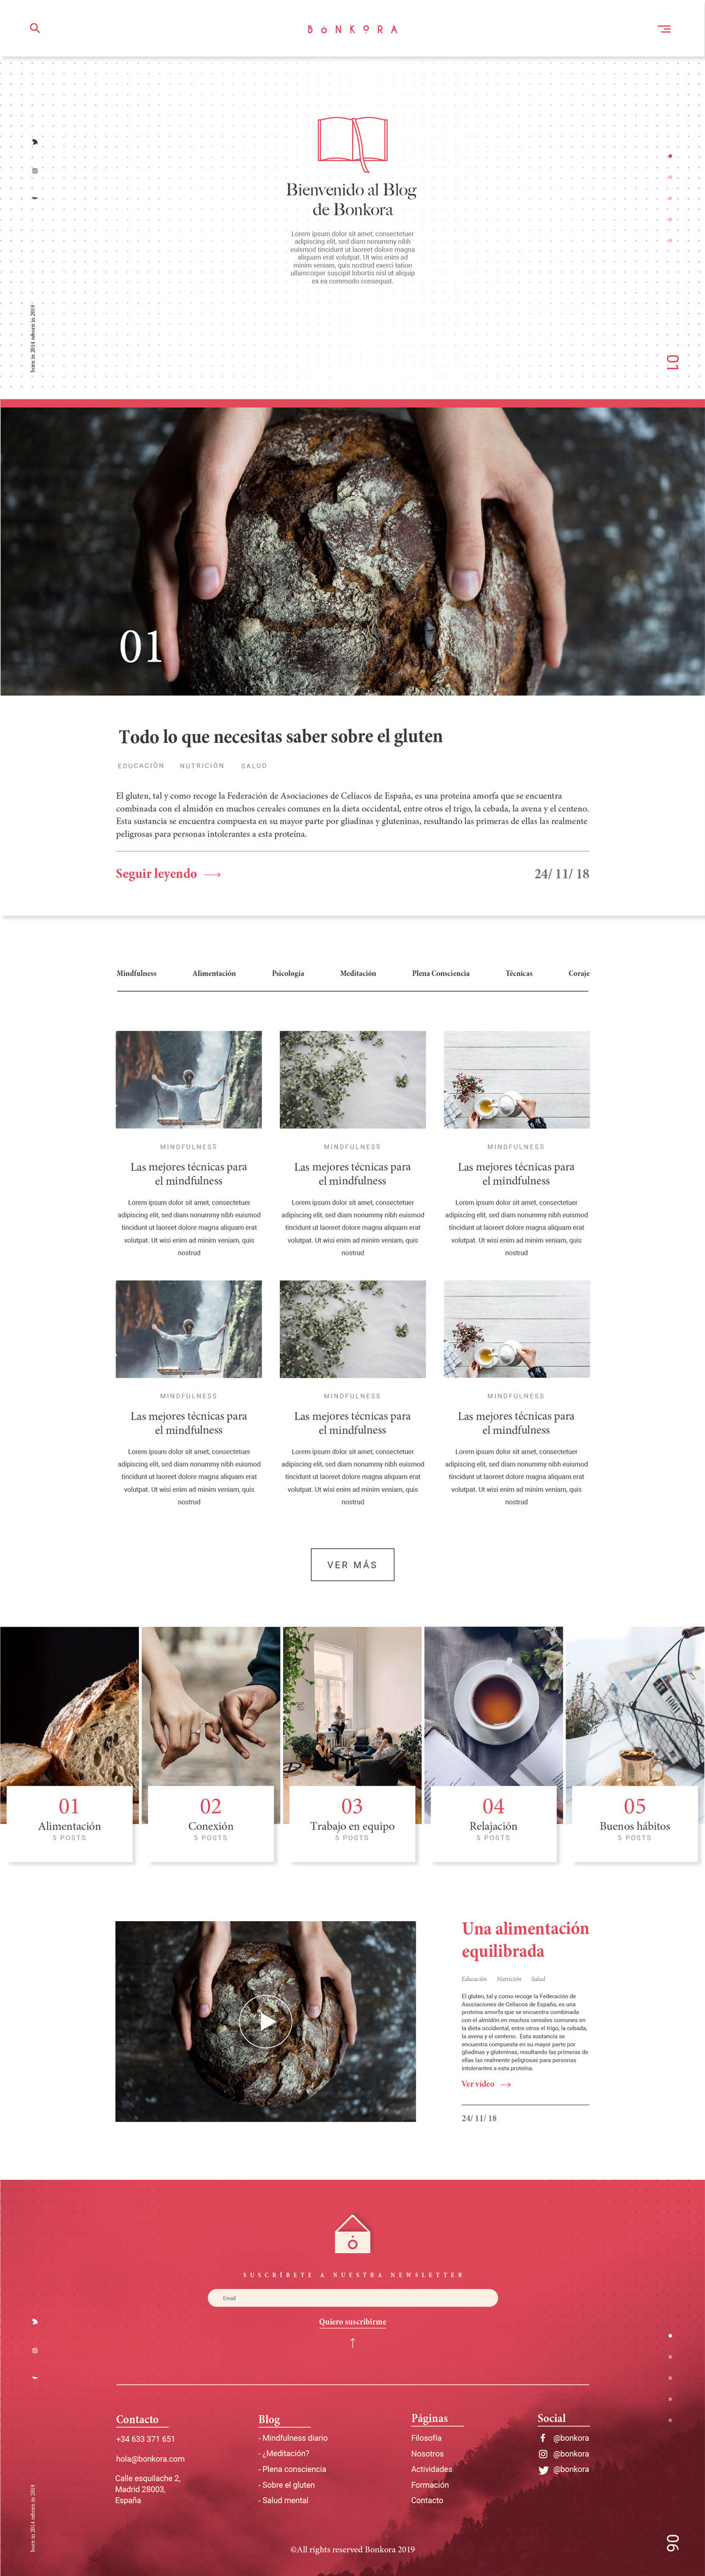 6.Blog.jpg